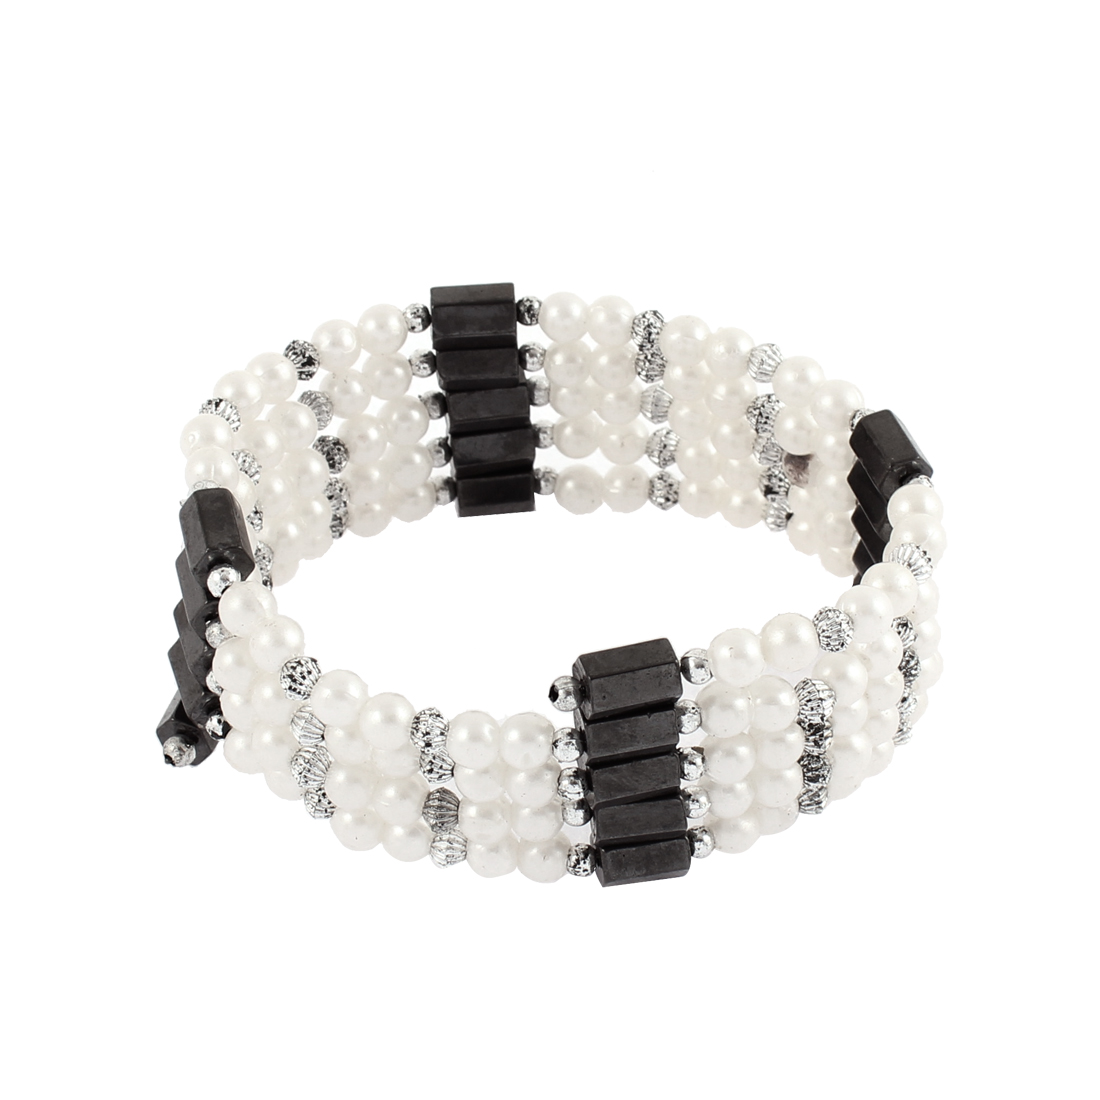 Women Magnet Clasp Hematite Magnetic Bracelet Choker Necklace White Black